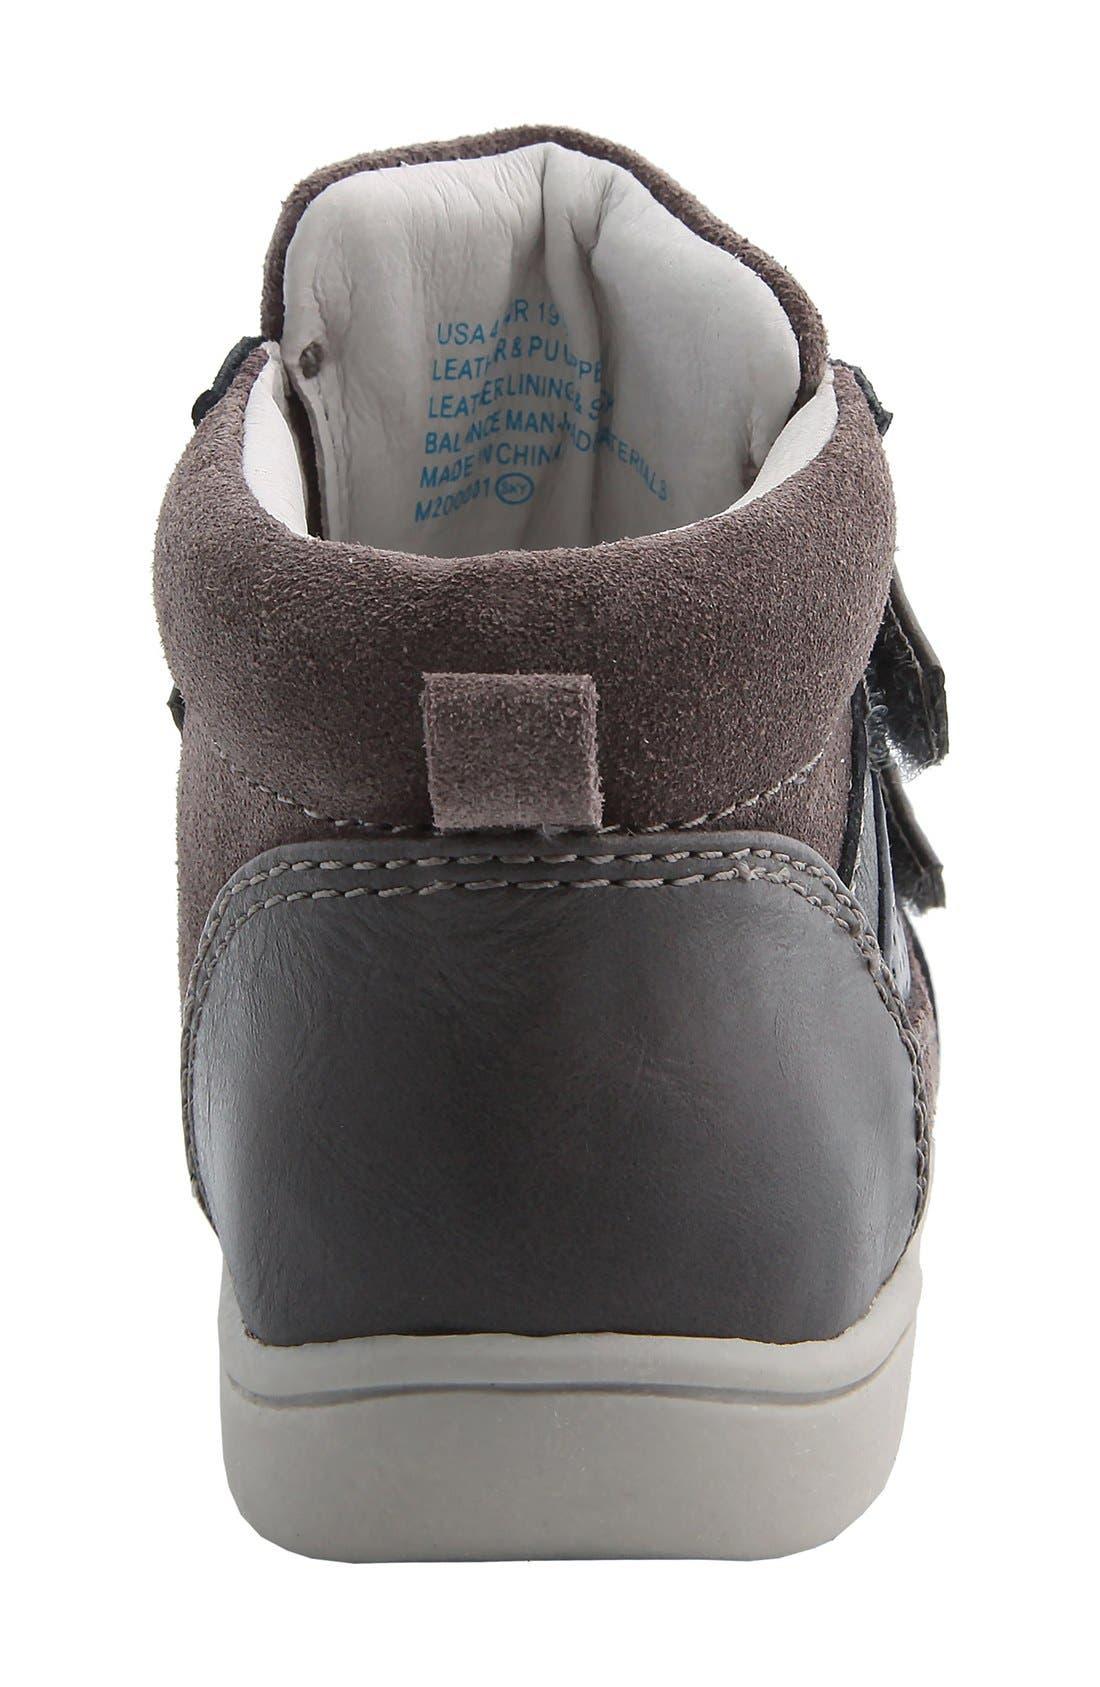 Nina 'Cairo' High Top Sneaker,                             Alternate thumbnail 4, color,                             064